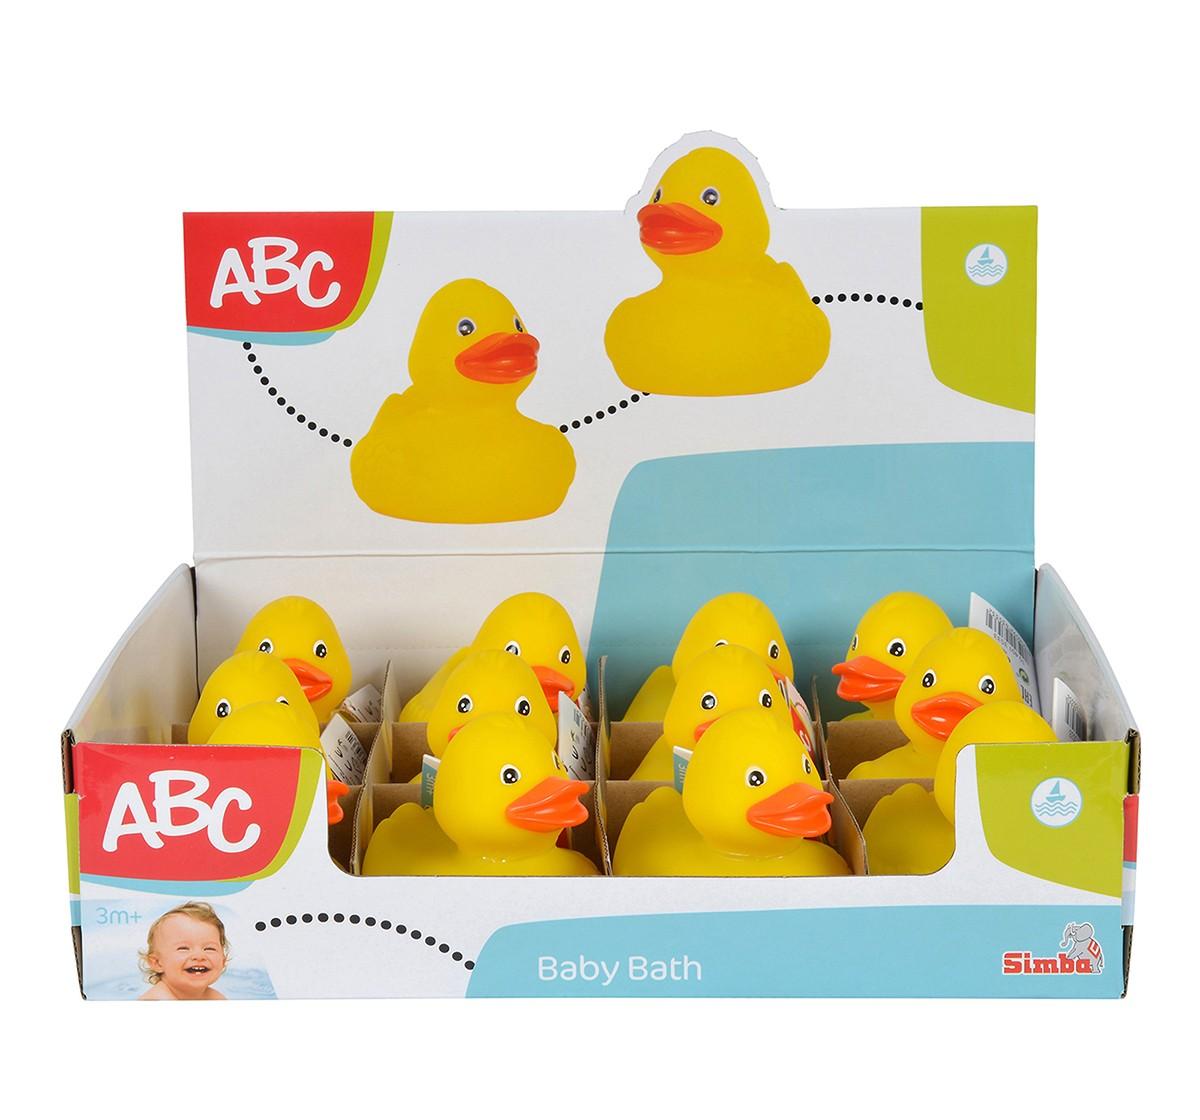 Simba Abc Rubber Ducks In Display Assorted, Unisex, 0M+ (Yellow)